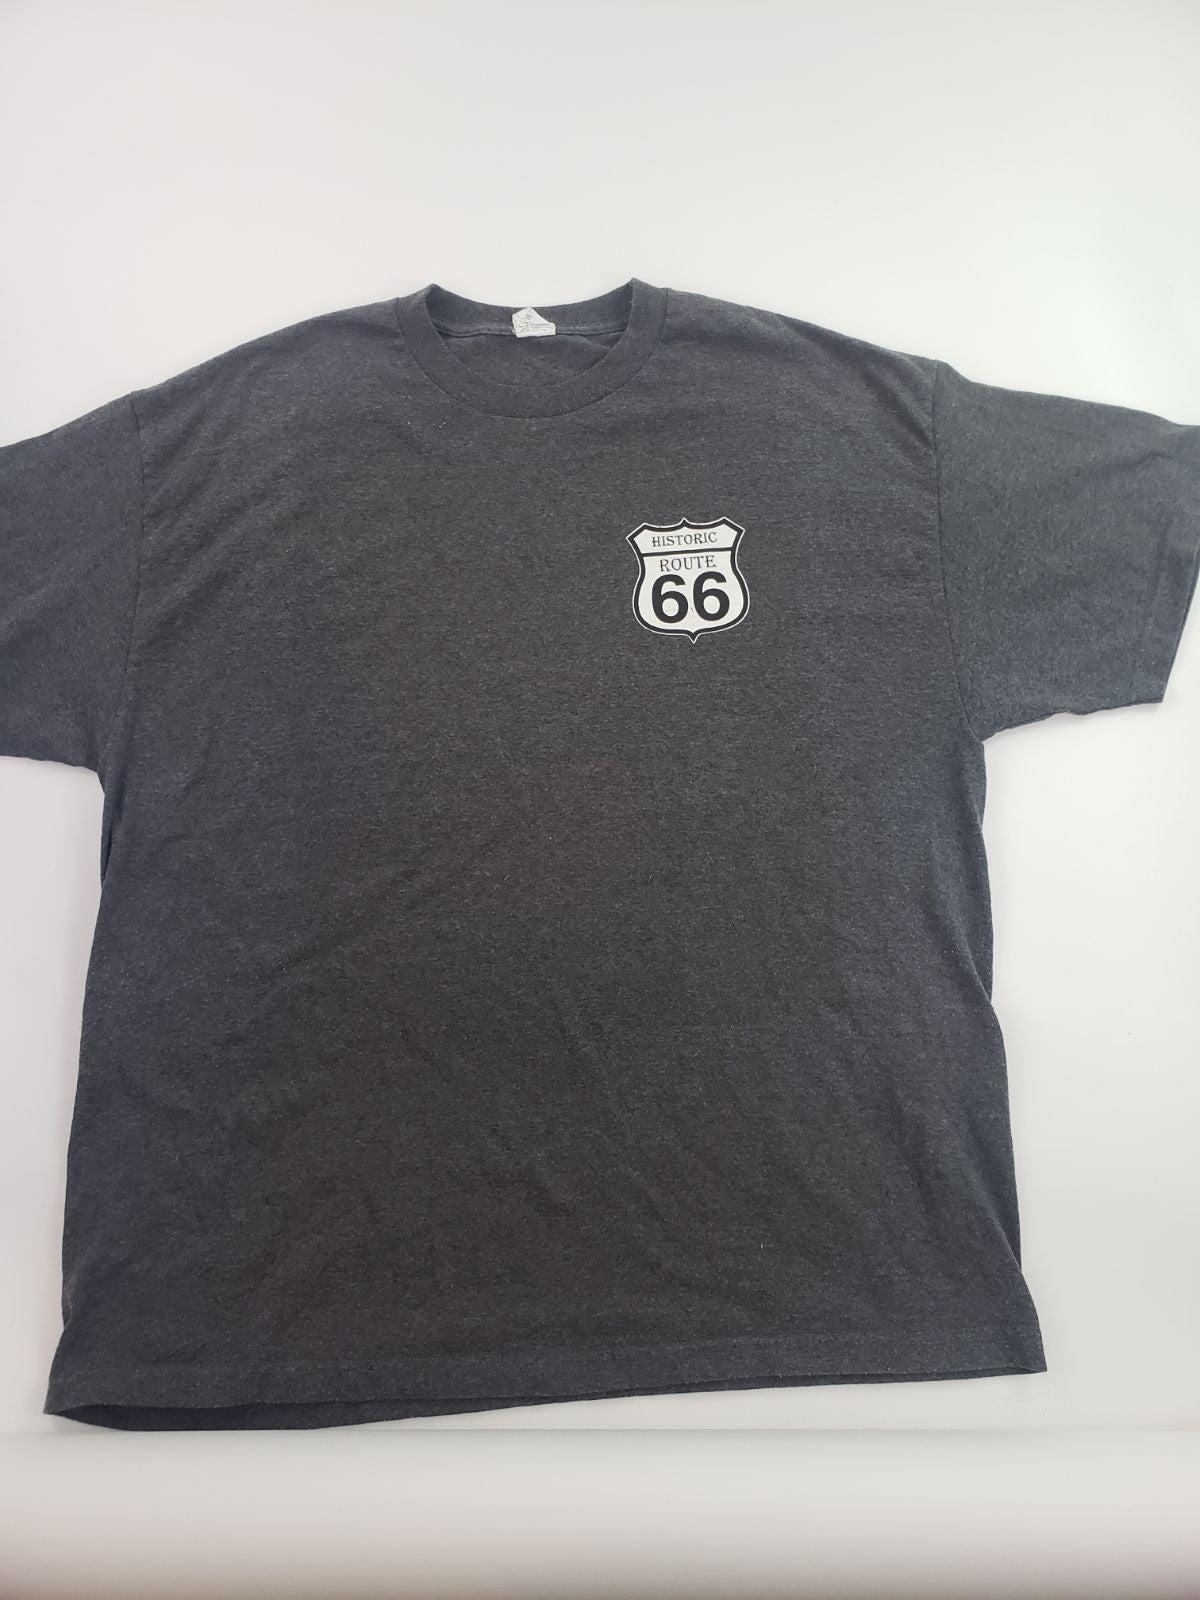 Route 66 Mens Grey Shirt 2XL